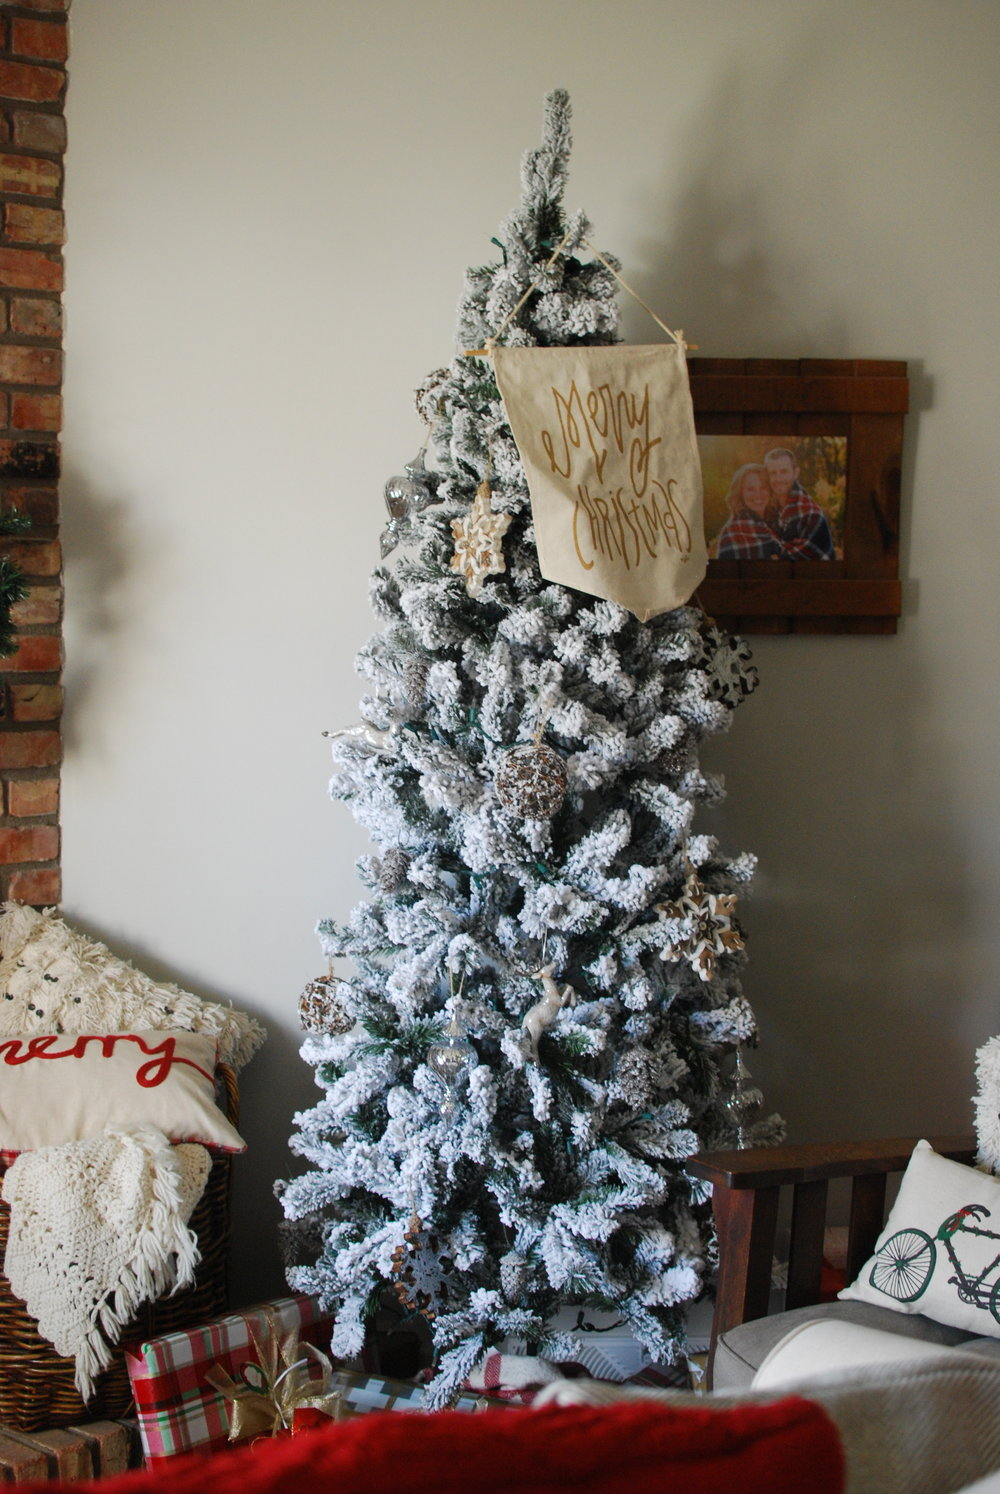 That Big Comfy Chair & A Little Bit of Christmas! — greywoodmama